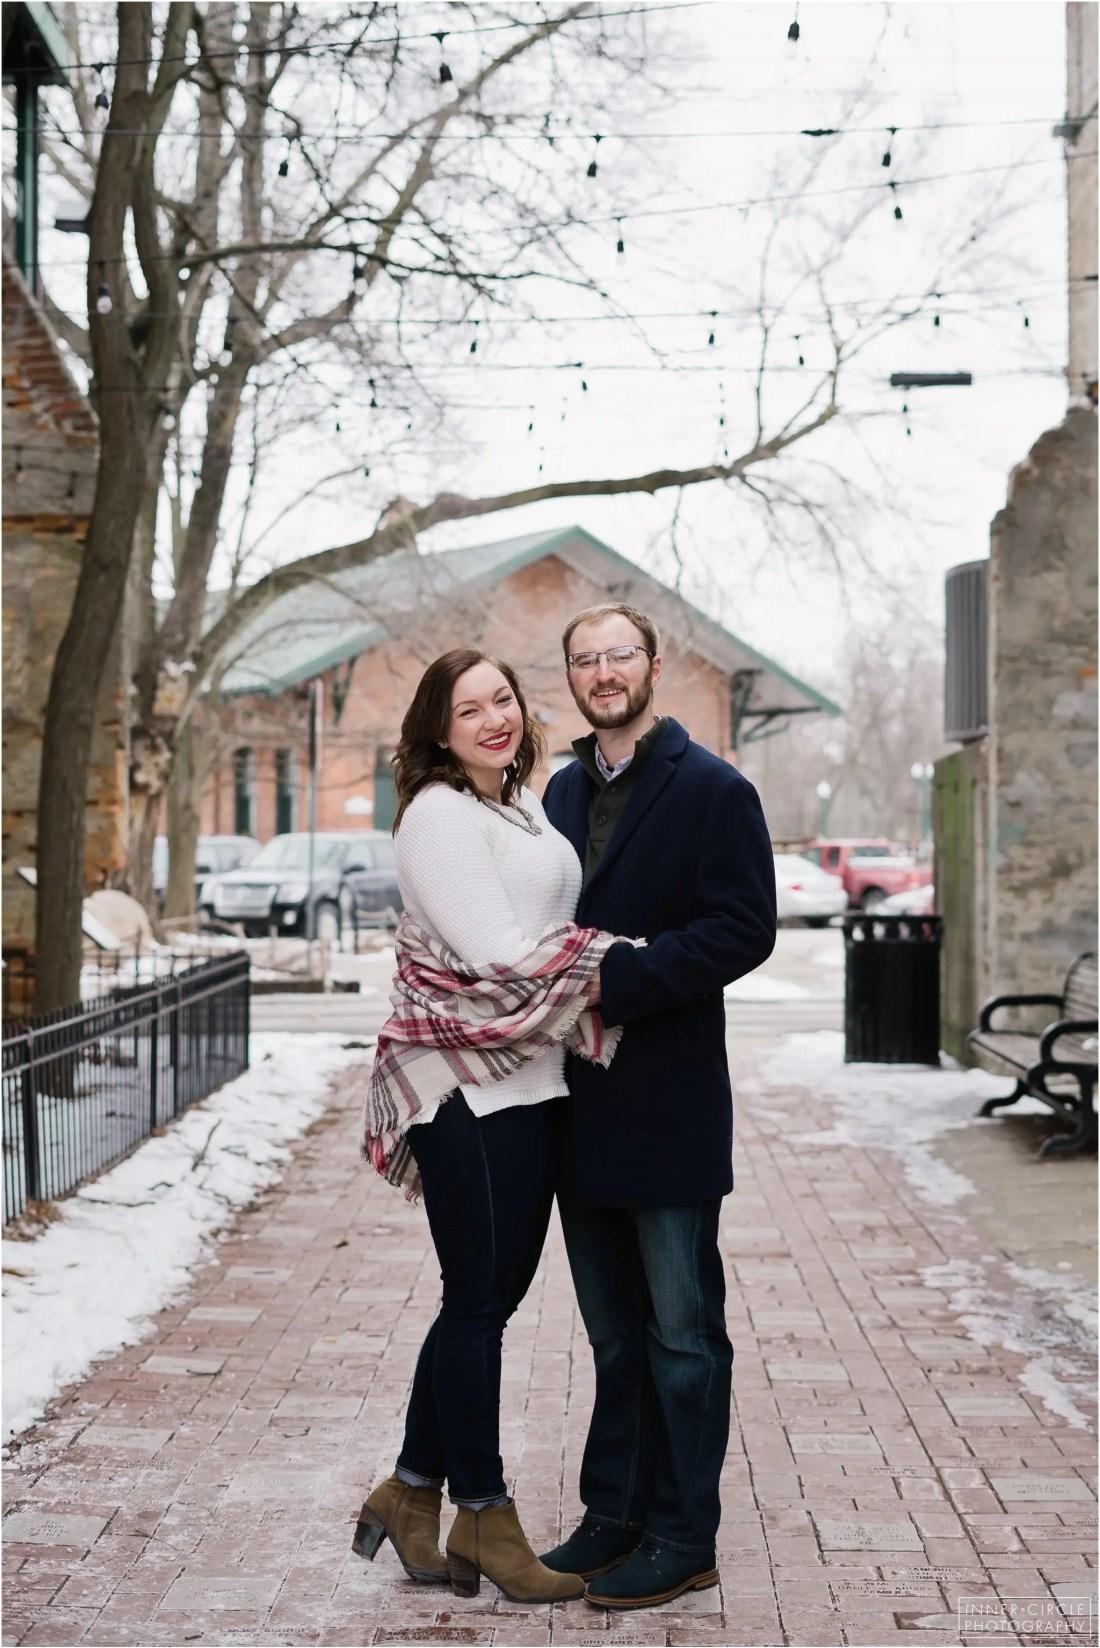 lukelauren_ENGAGED_InnerCirclePhoto_002 Engagement - Wedding  Michigan Photography